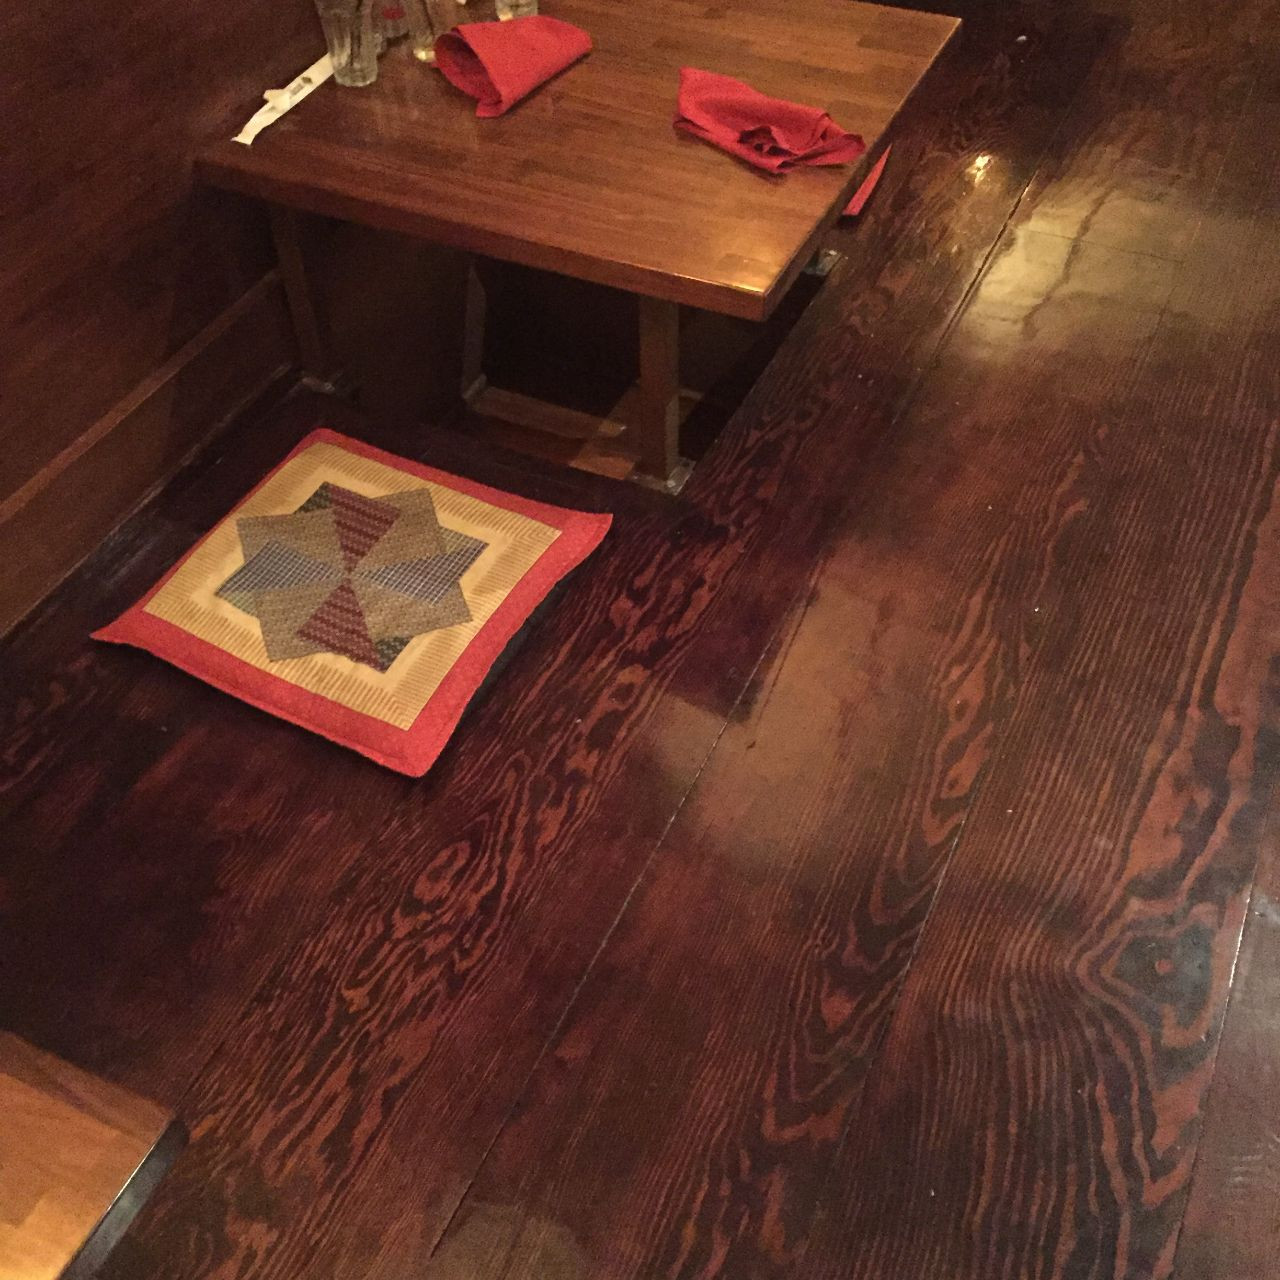 17 Spectacular Hardwood Flooring Inland Empire 2021 free download hardwood flooring inland empire of irori sushi restaurant marina del rey ca opentable for 25040265